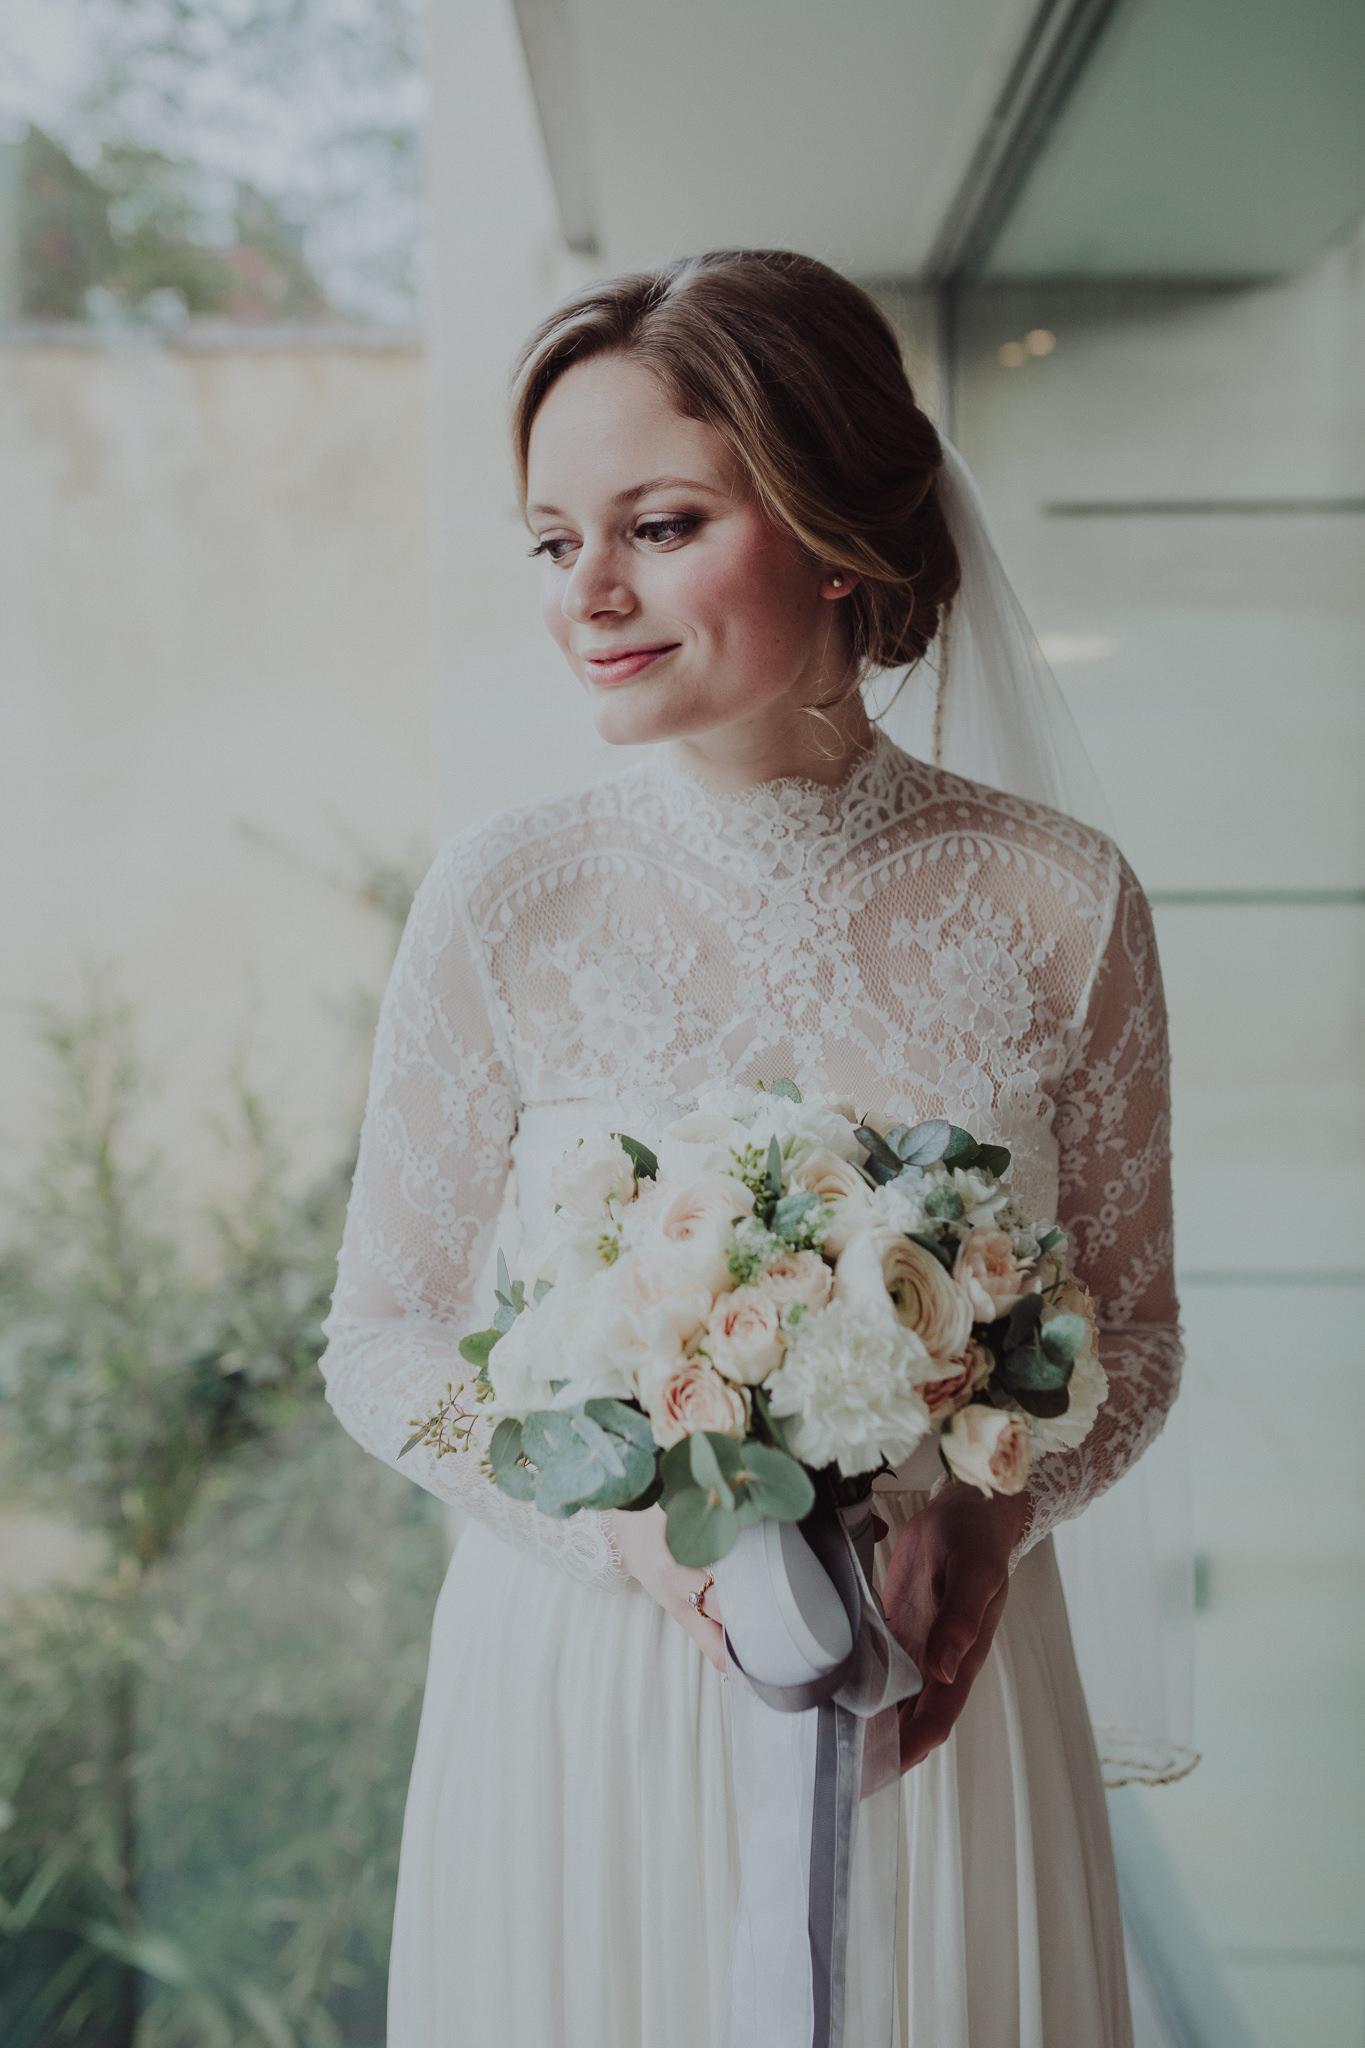 hampstead_wedding_photography_kate_gray-8.jpg